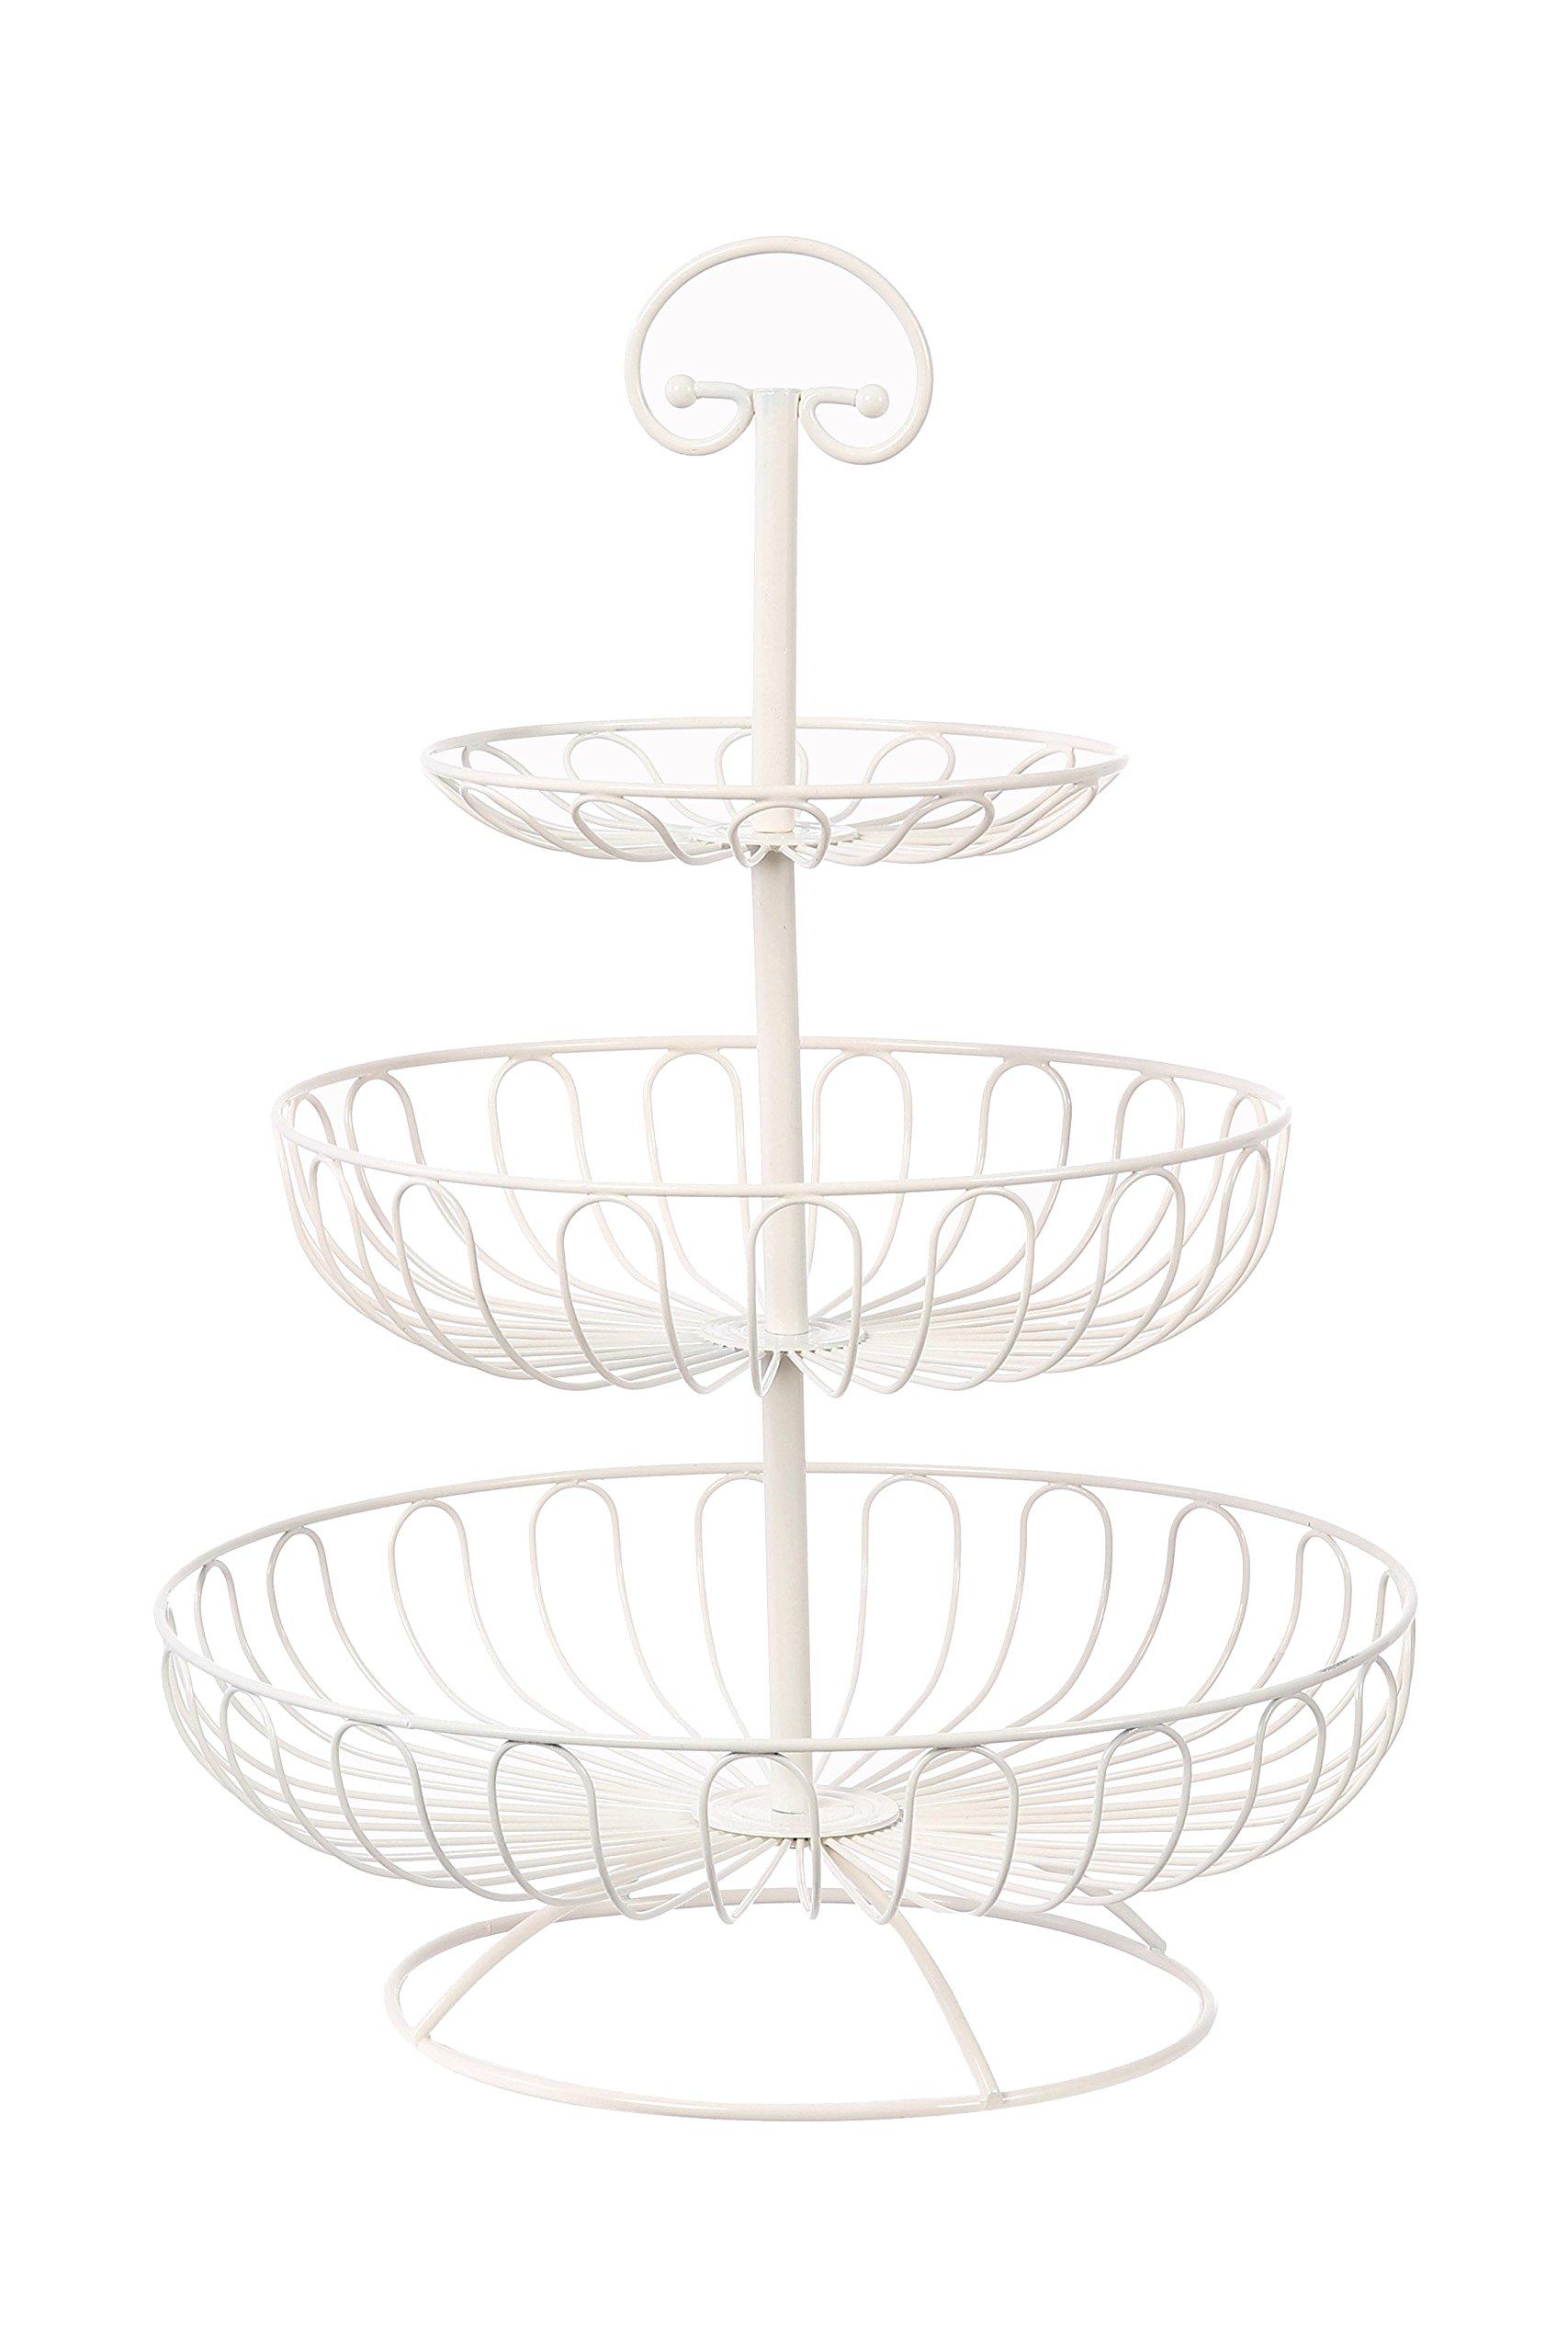 Juvale 3-Tier Decorative Display Fruit Basket, Cream, 13'' x 13''